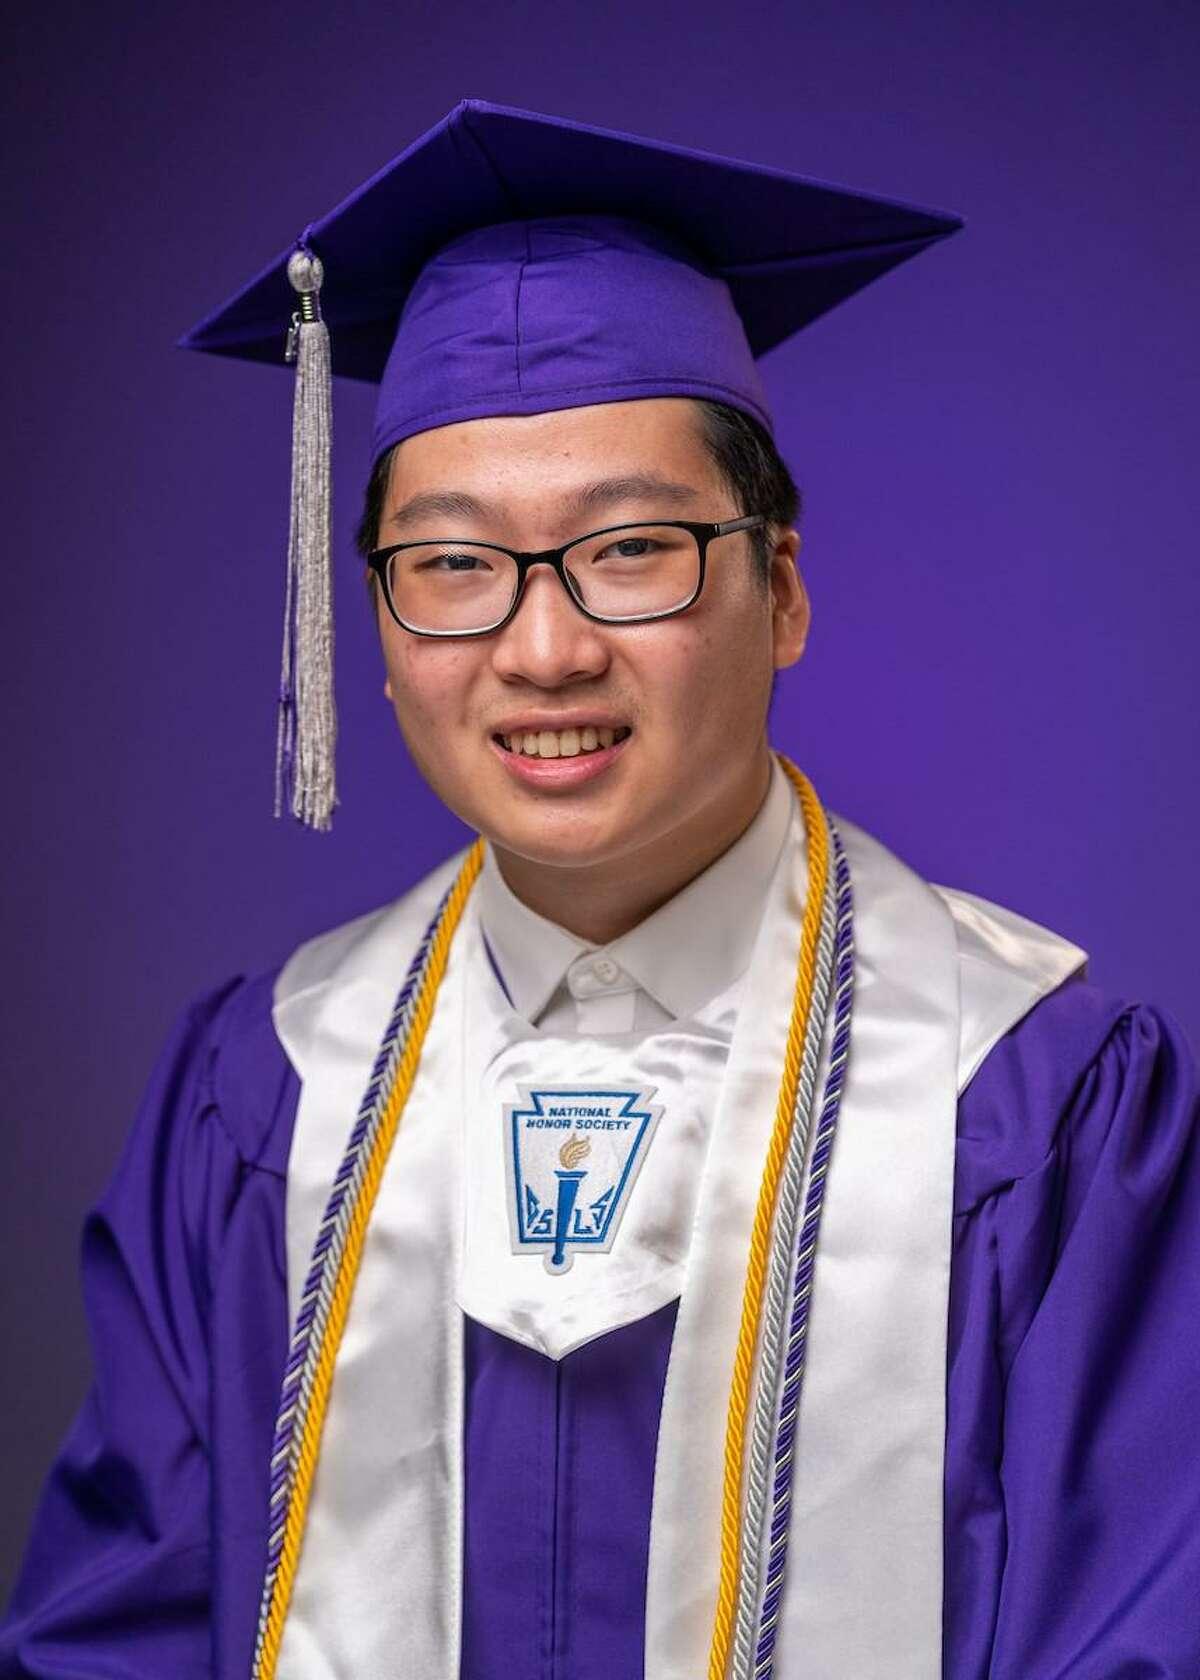 Cody Chou, Spring Early College Academy Valedictorian